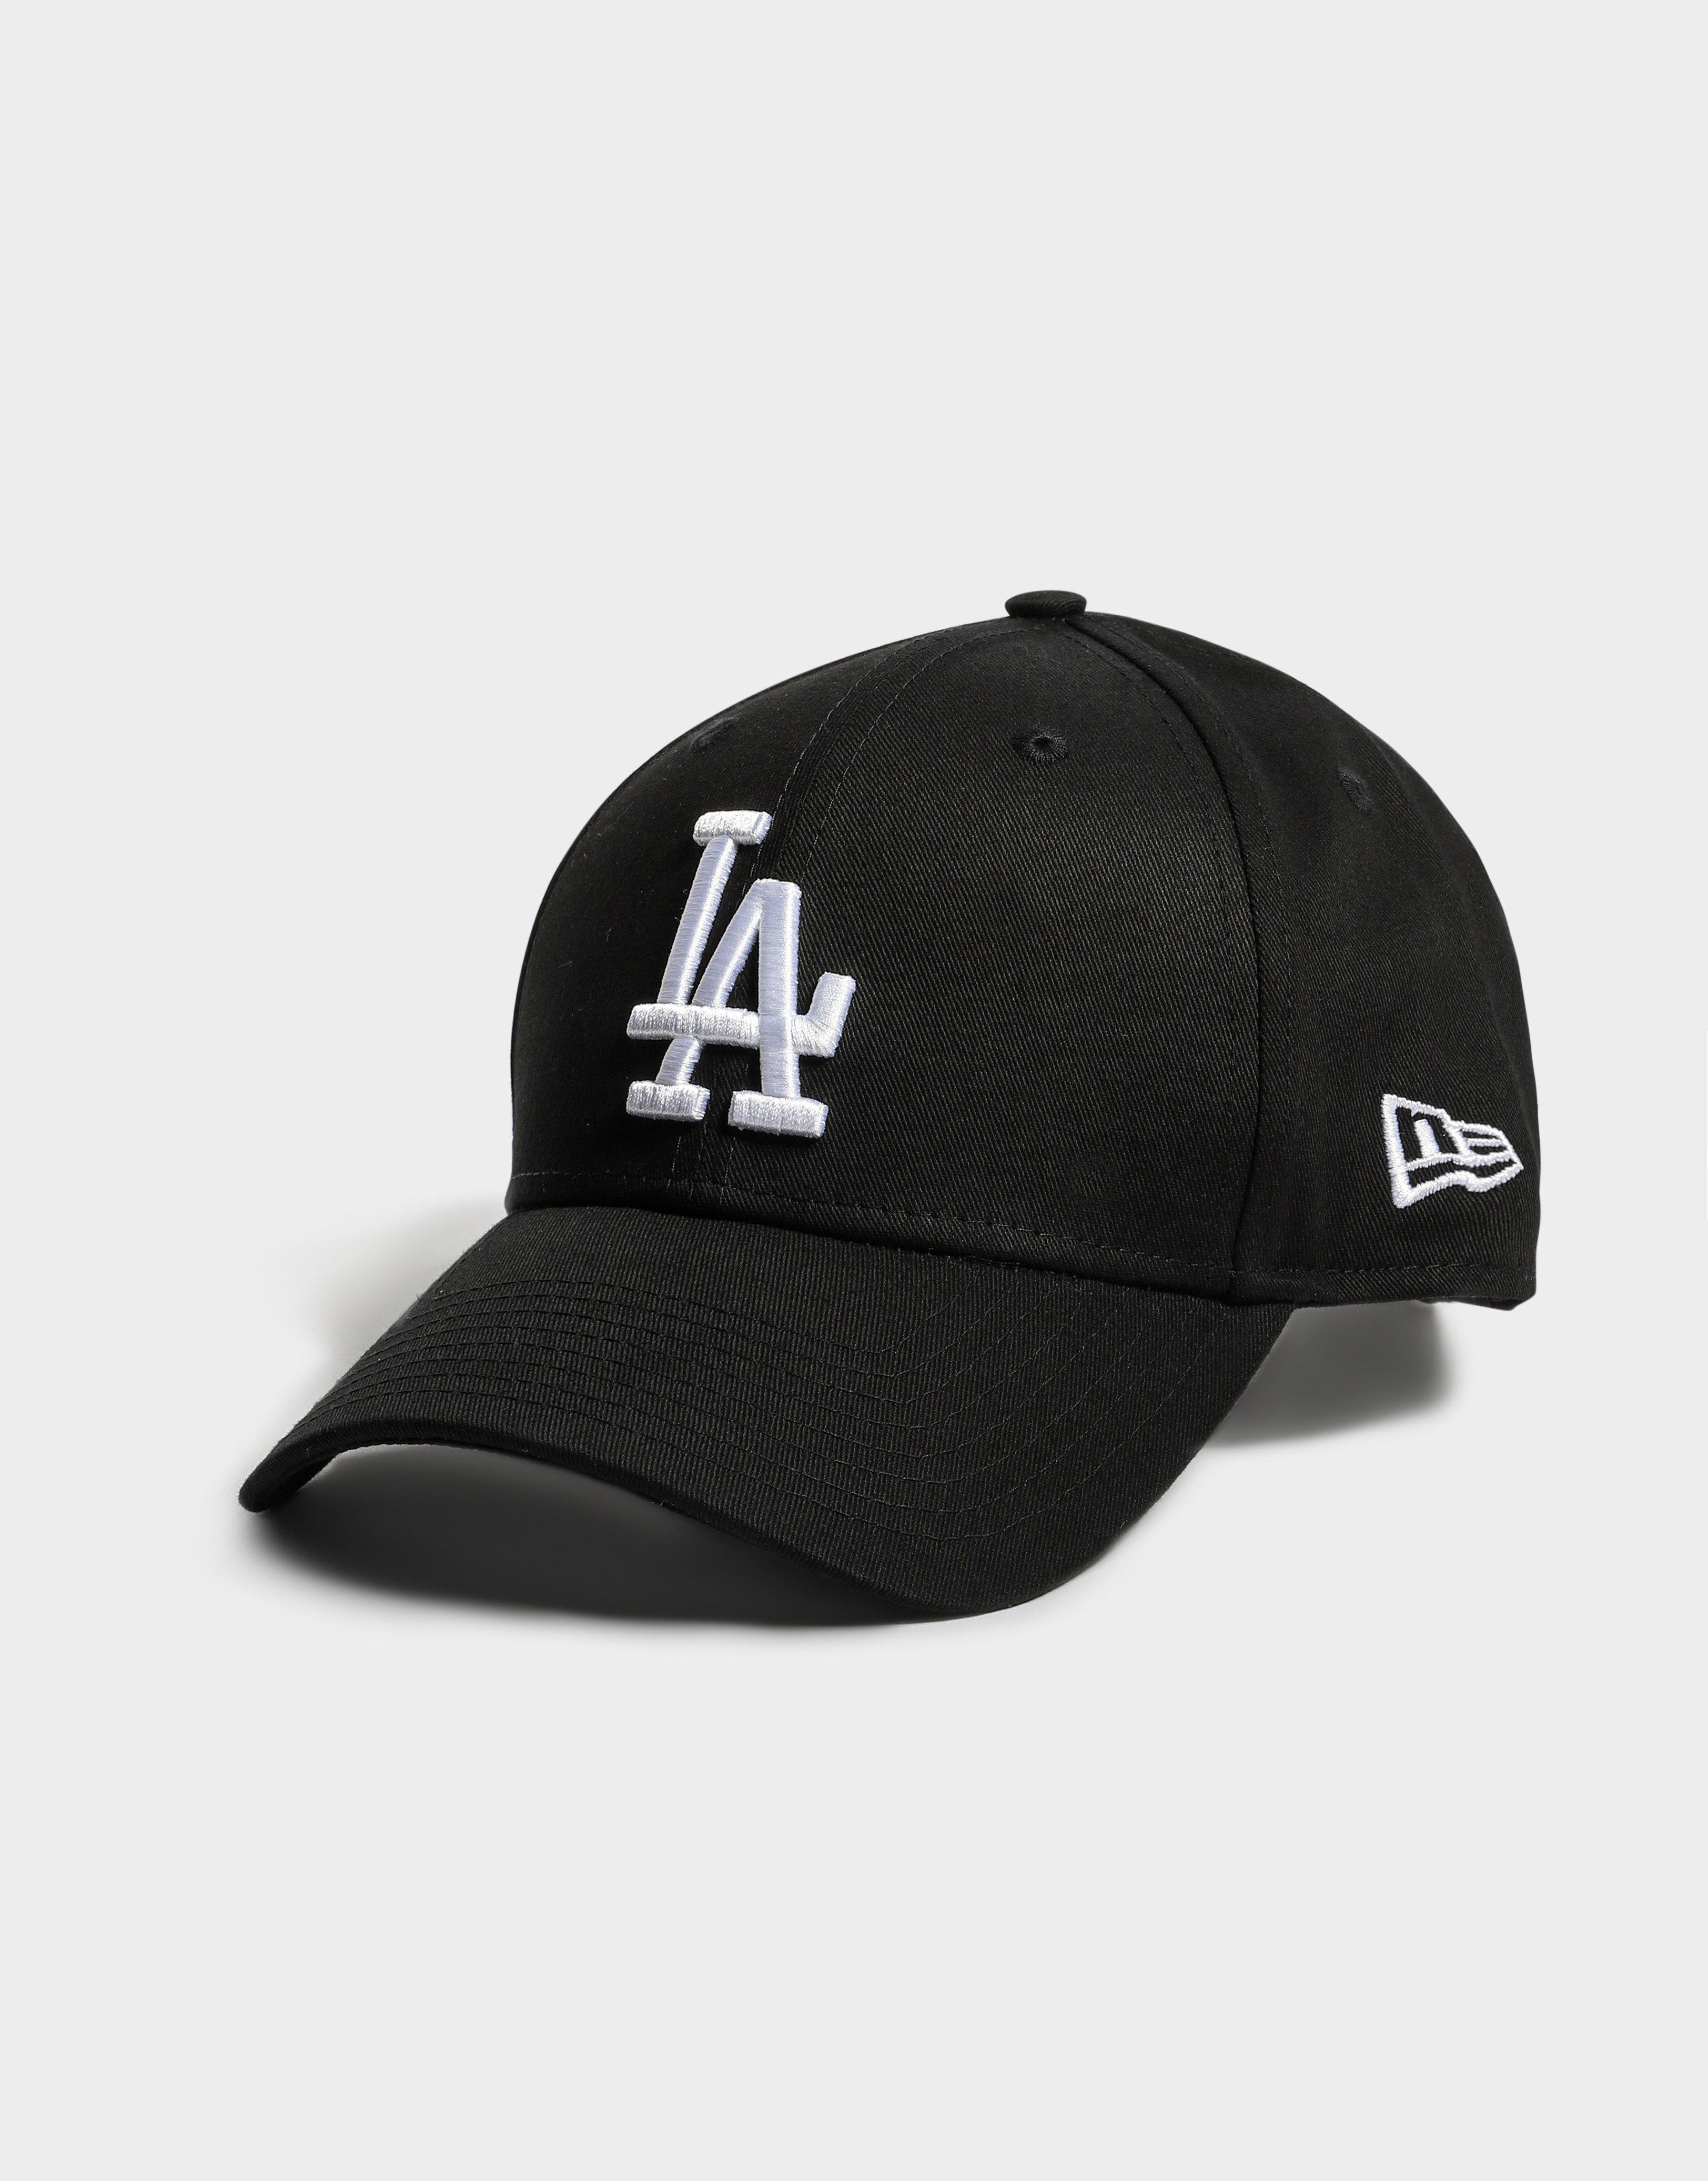 bae8d6ebea0 Cheap JD Sports Australia Hats Store products online Australia